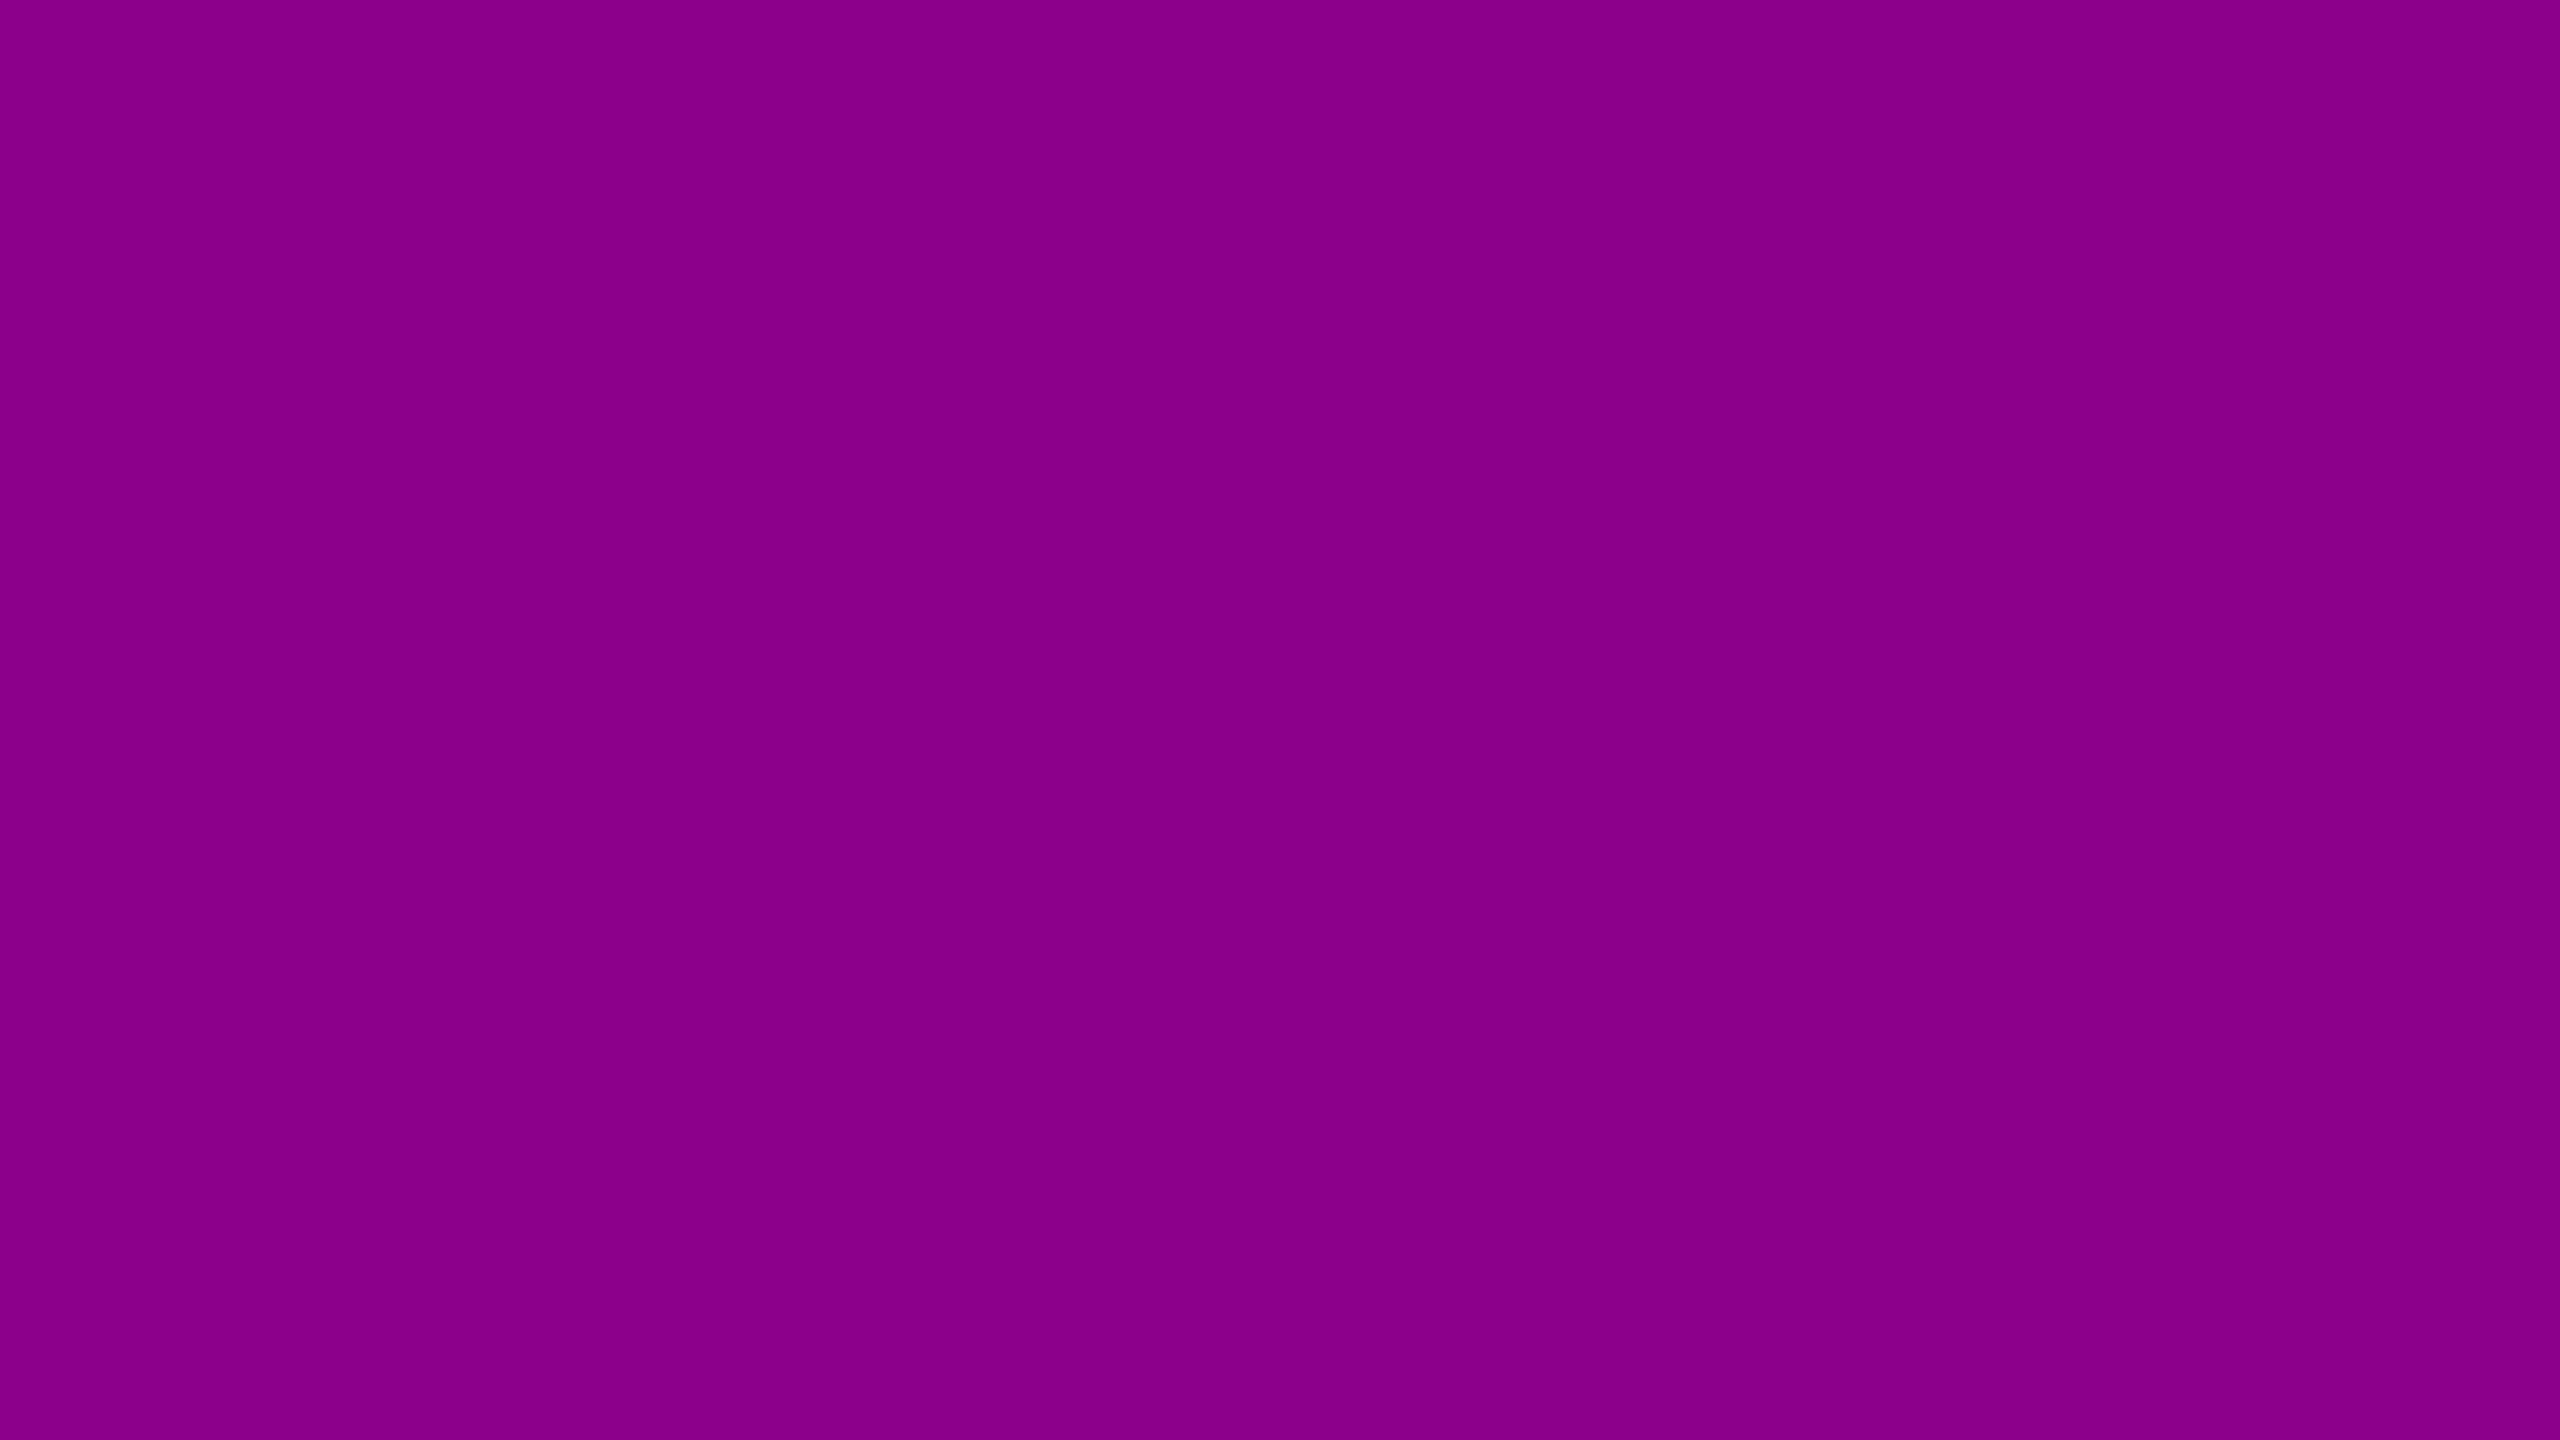 Http Imgarcade Com 1 Dark Magenta Background